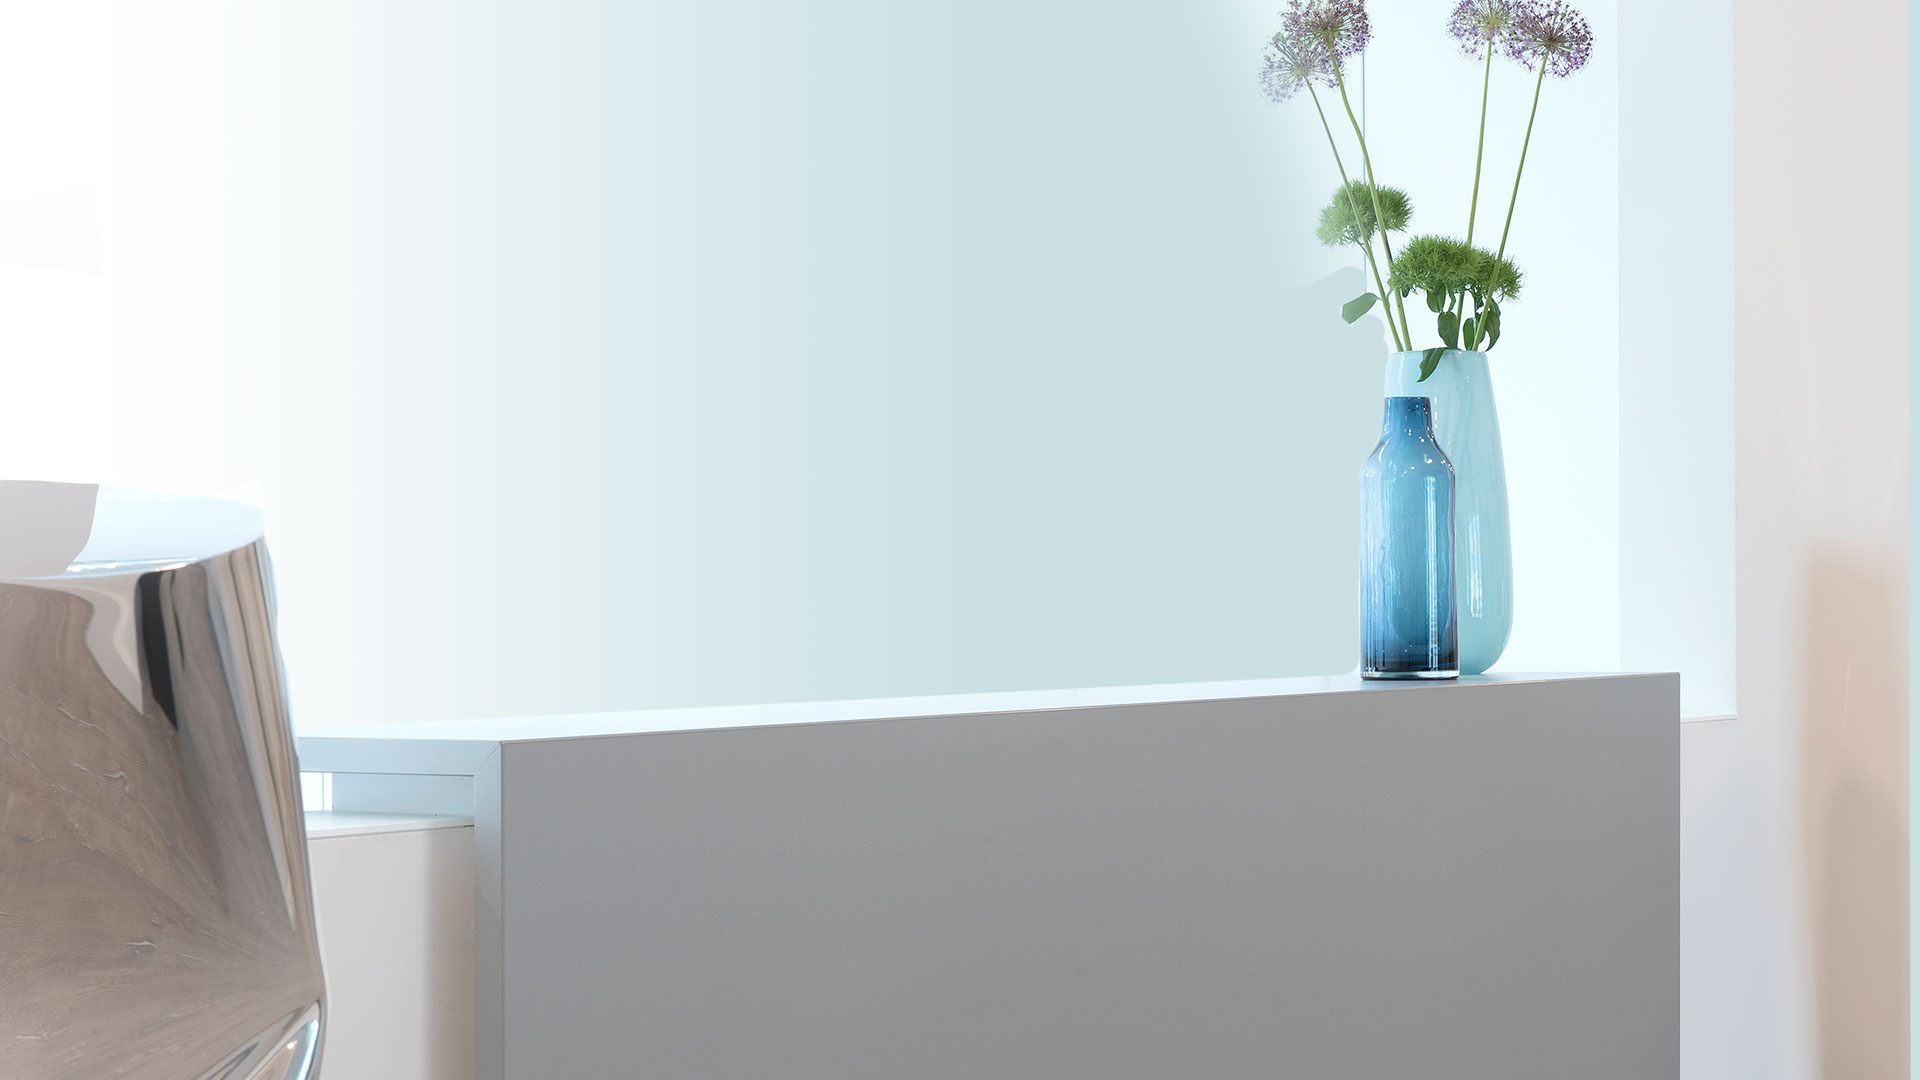 hauskauf vorsorgevollmacht ehevertr ge notar dr kessel. Black Bedroom Furniture Sets. Home Design Ideas